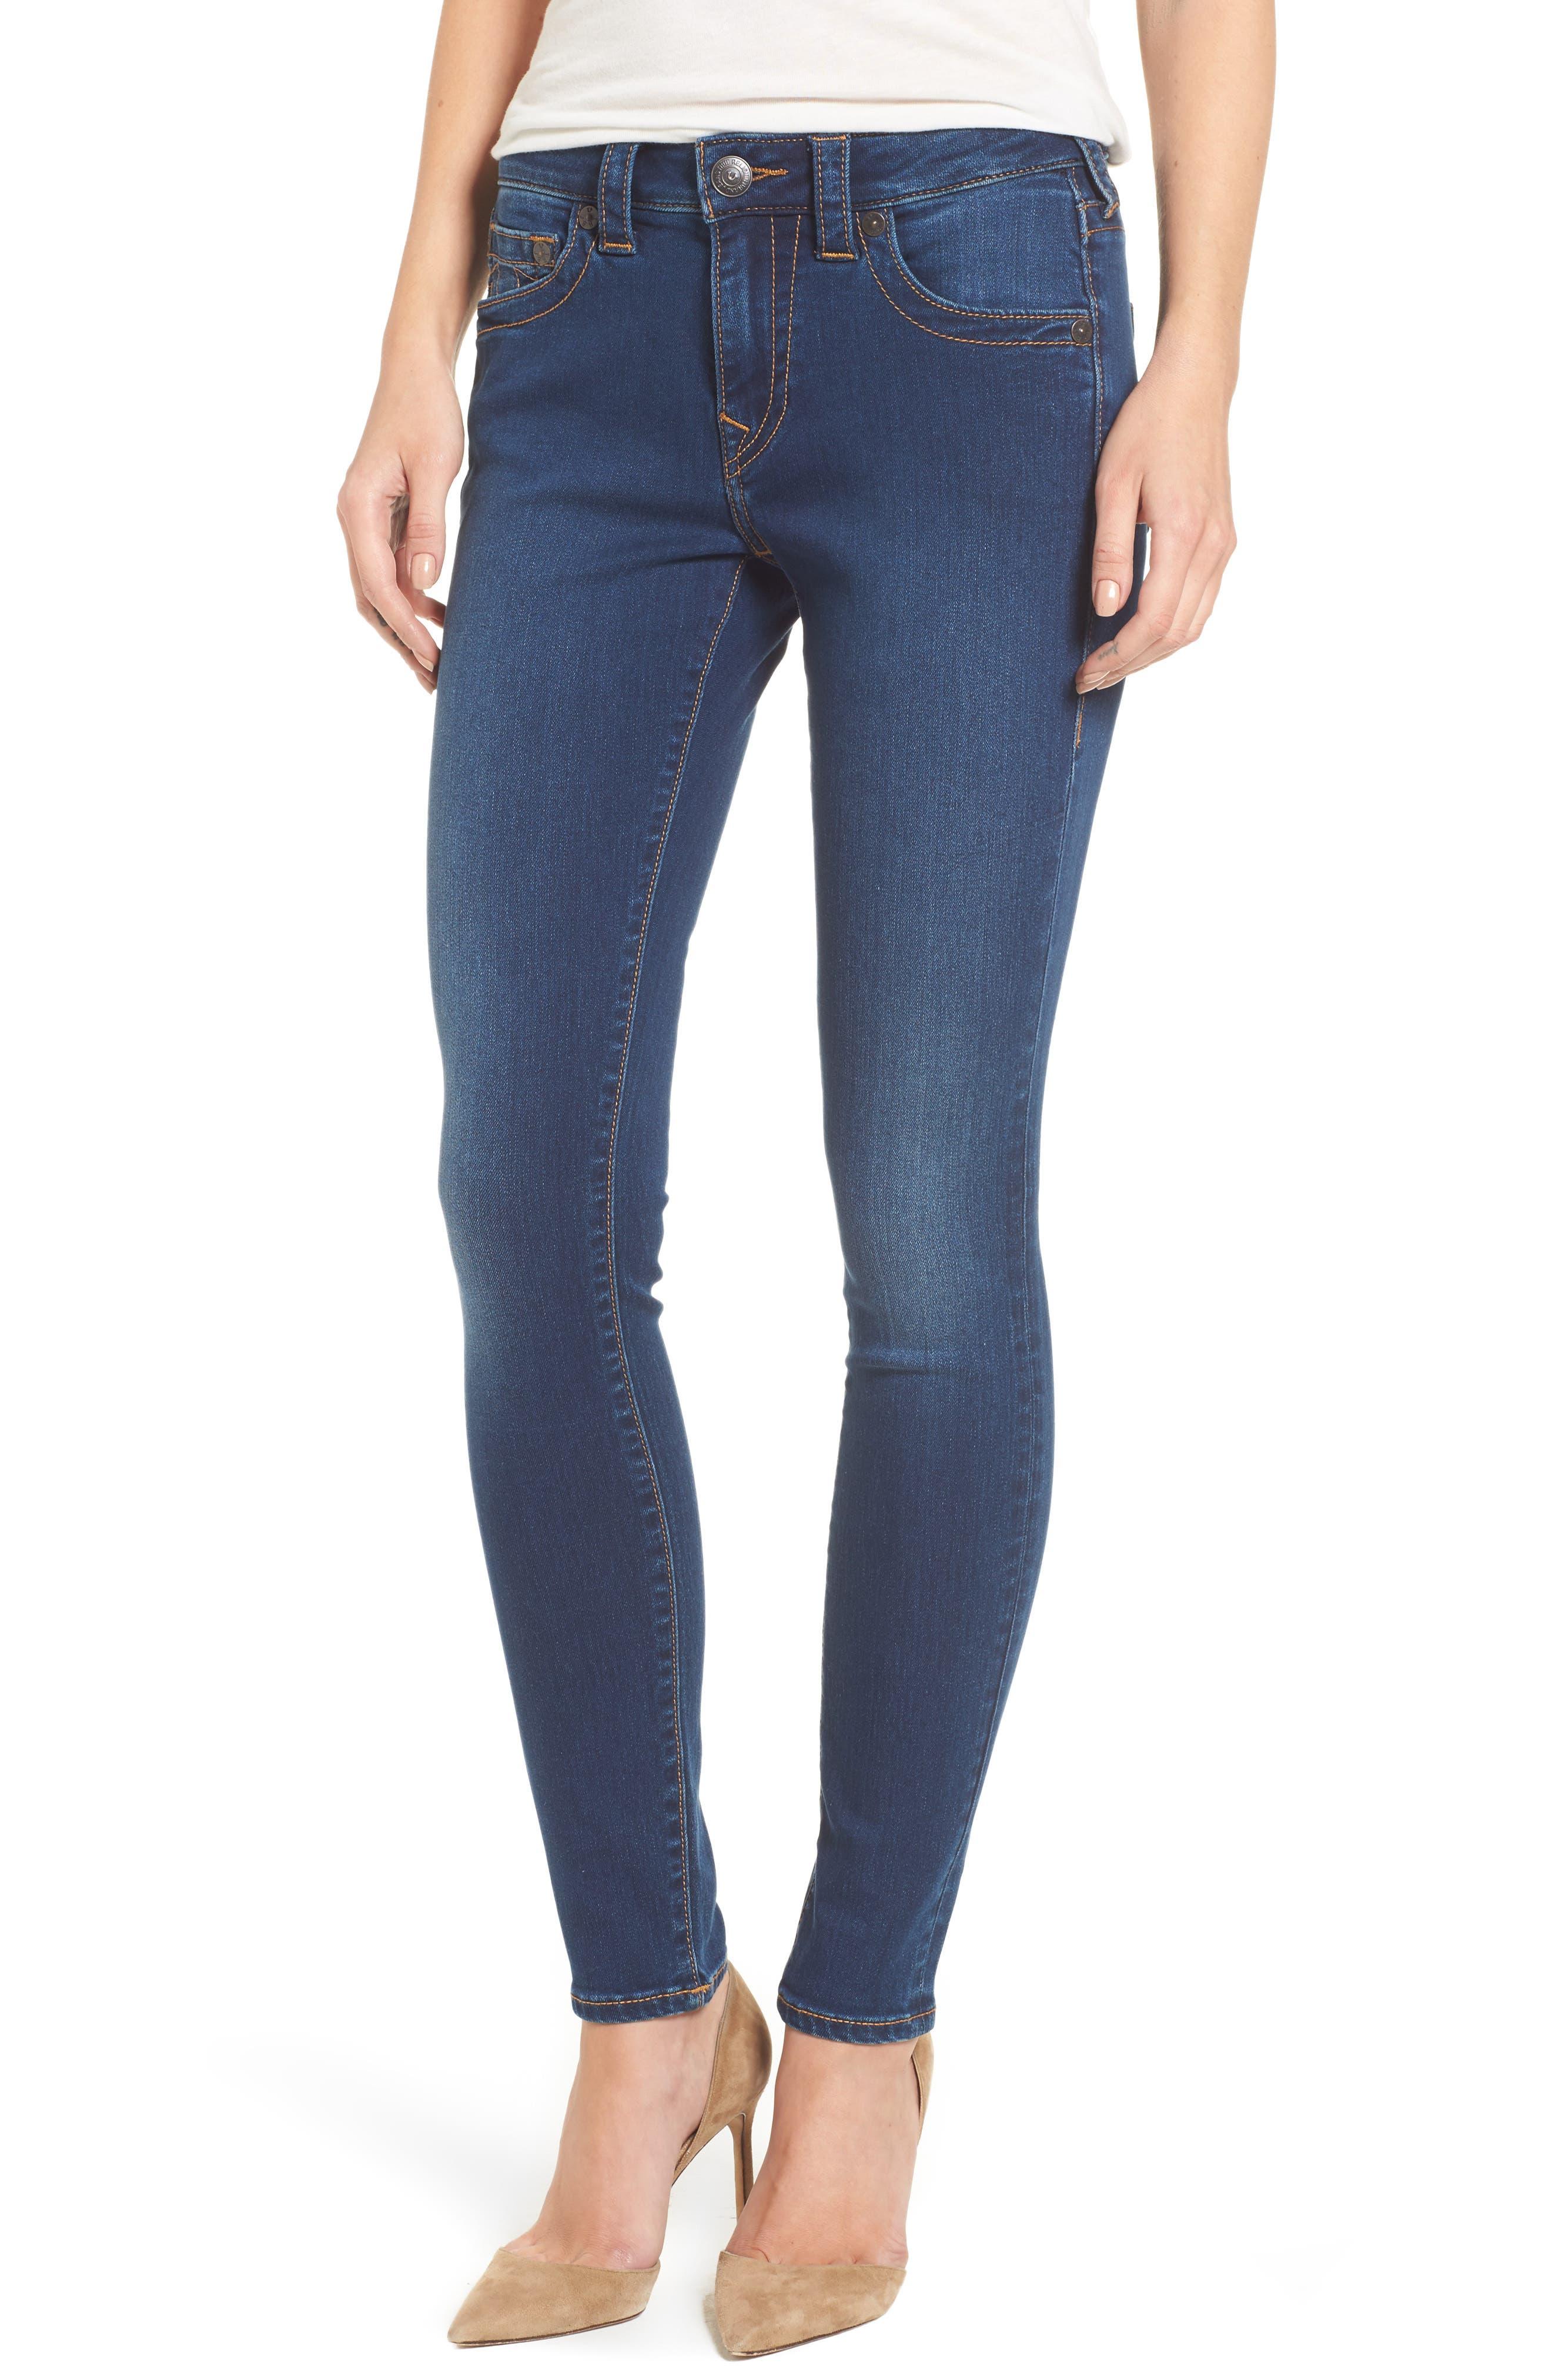 Jennie Curvy Skinny Jeans,                         Main,                         color, Lands End Indigo